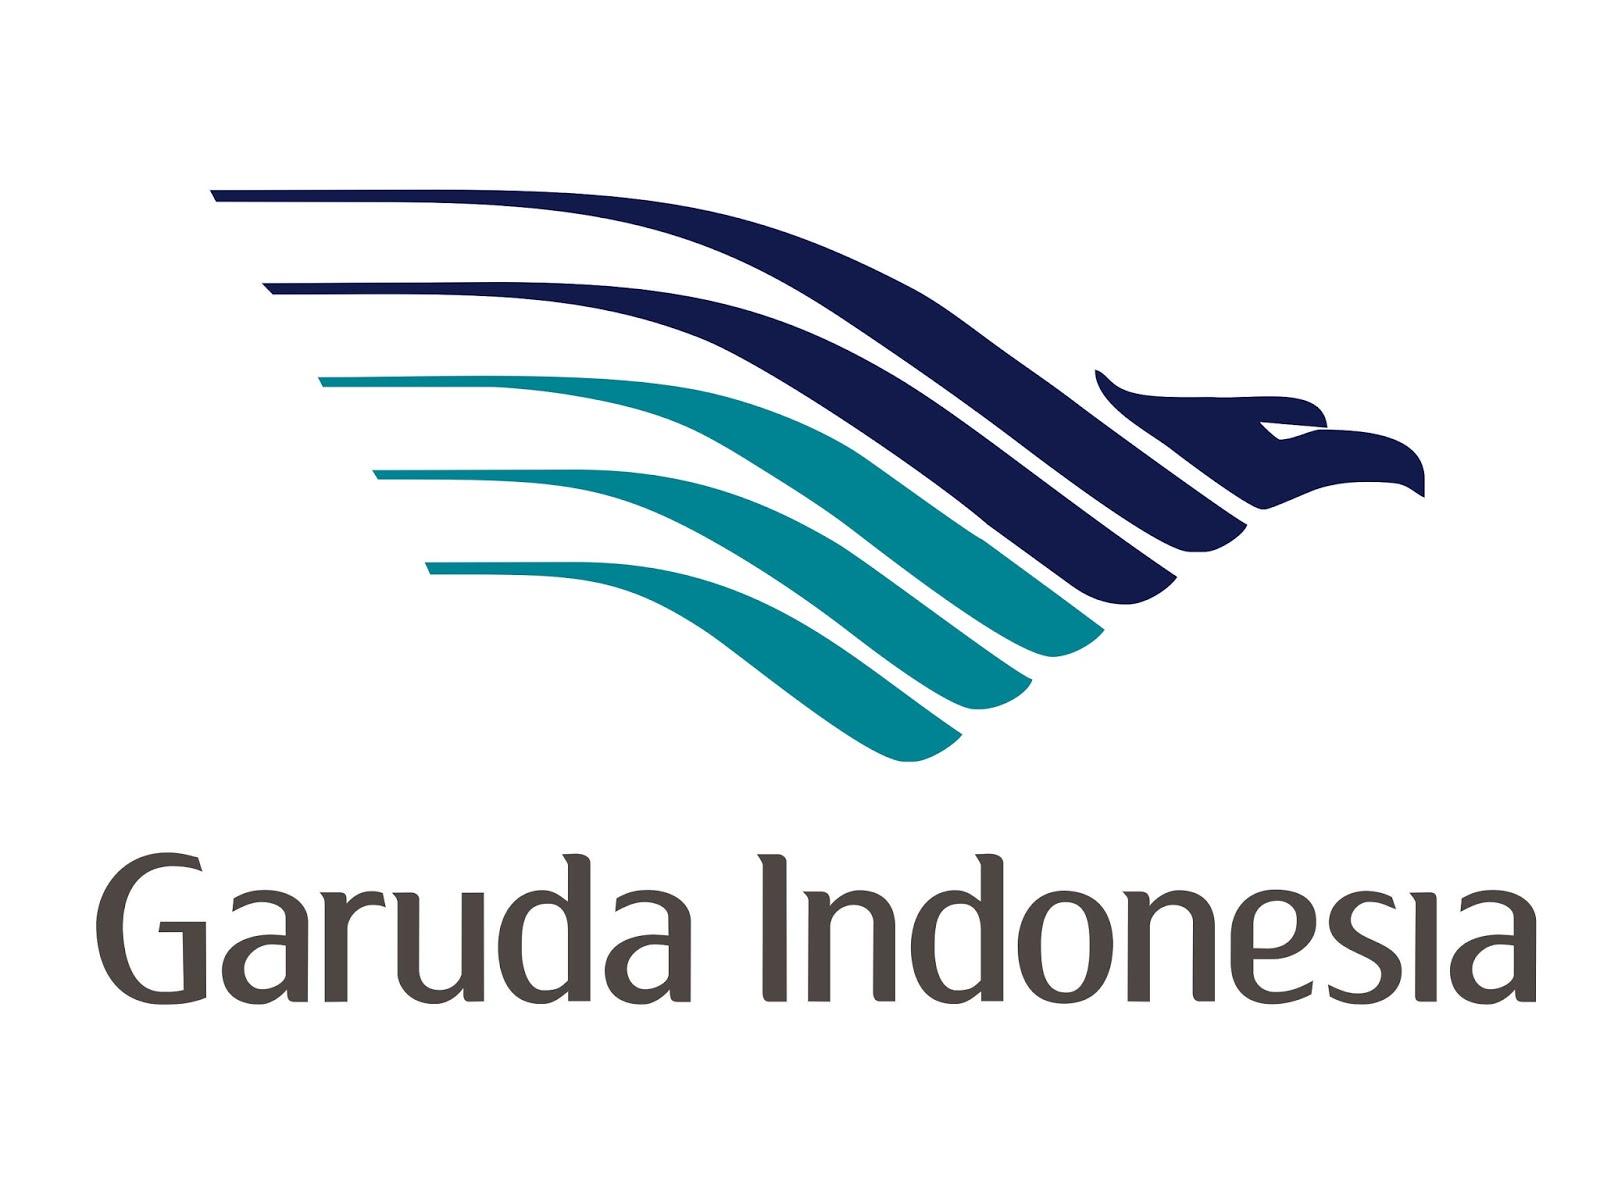 garuda indonesia.jpg